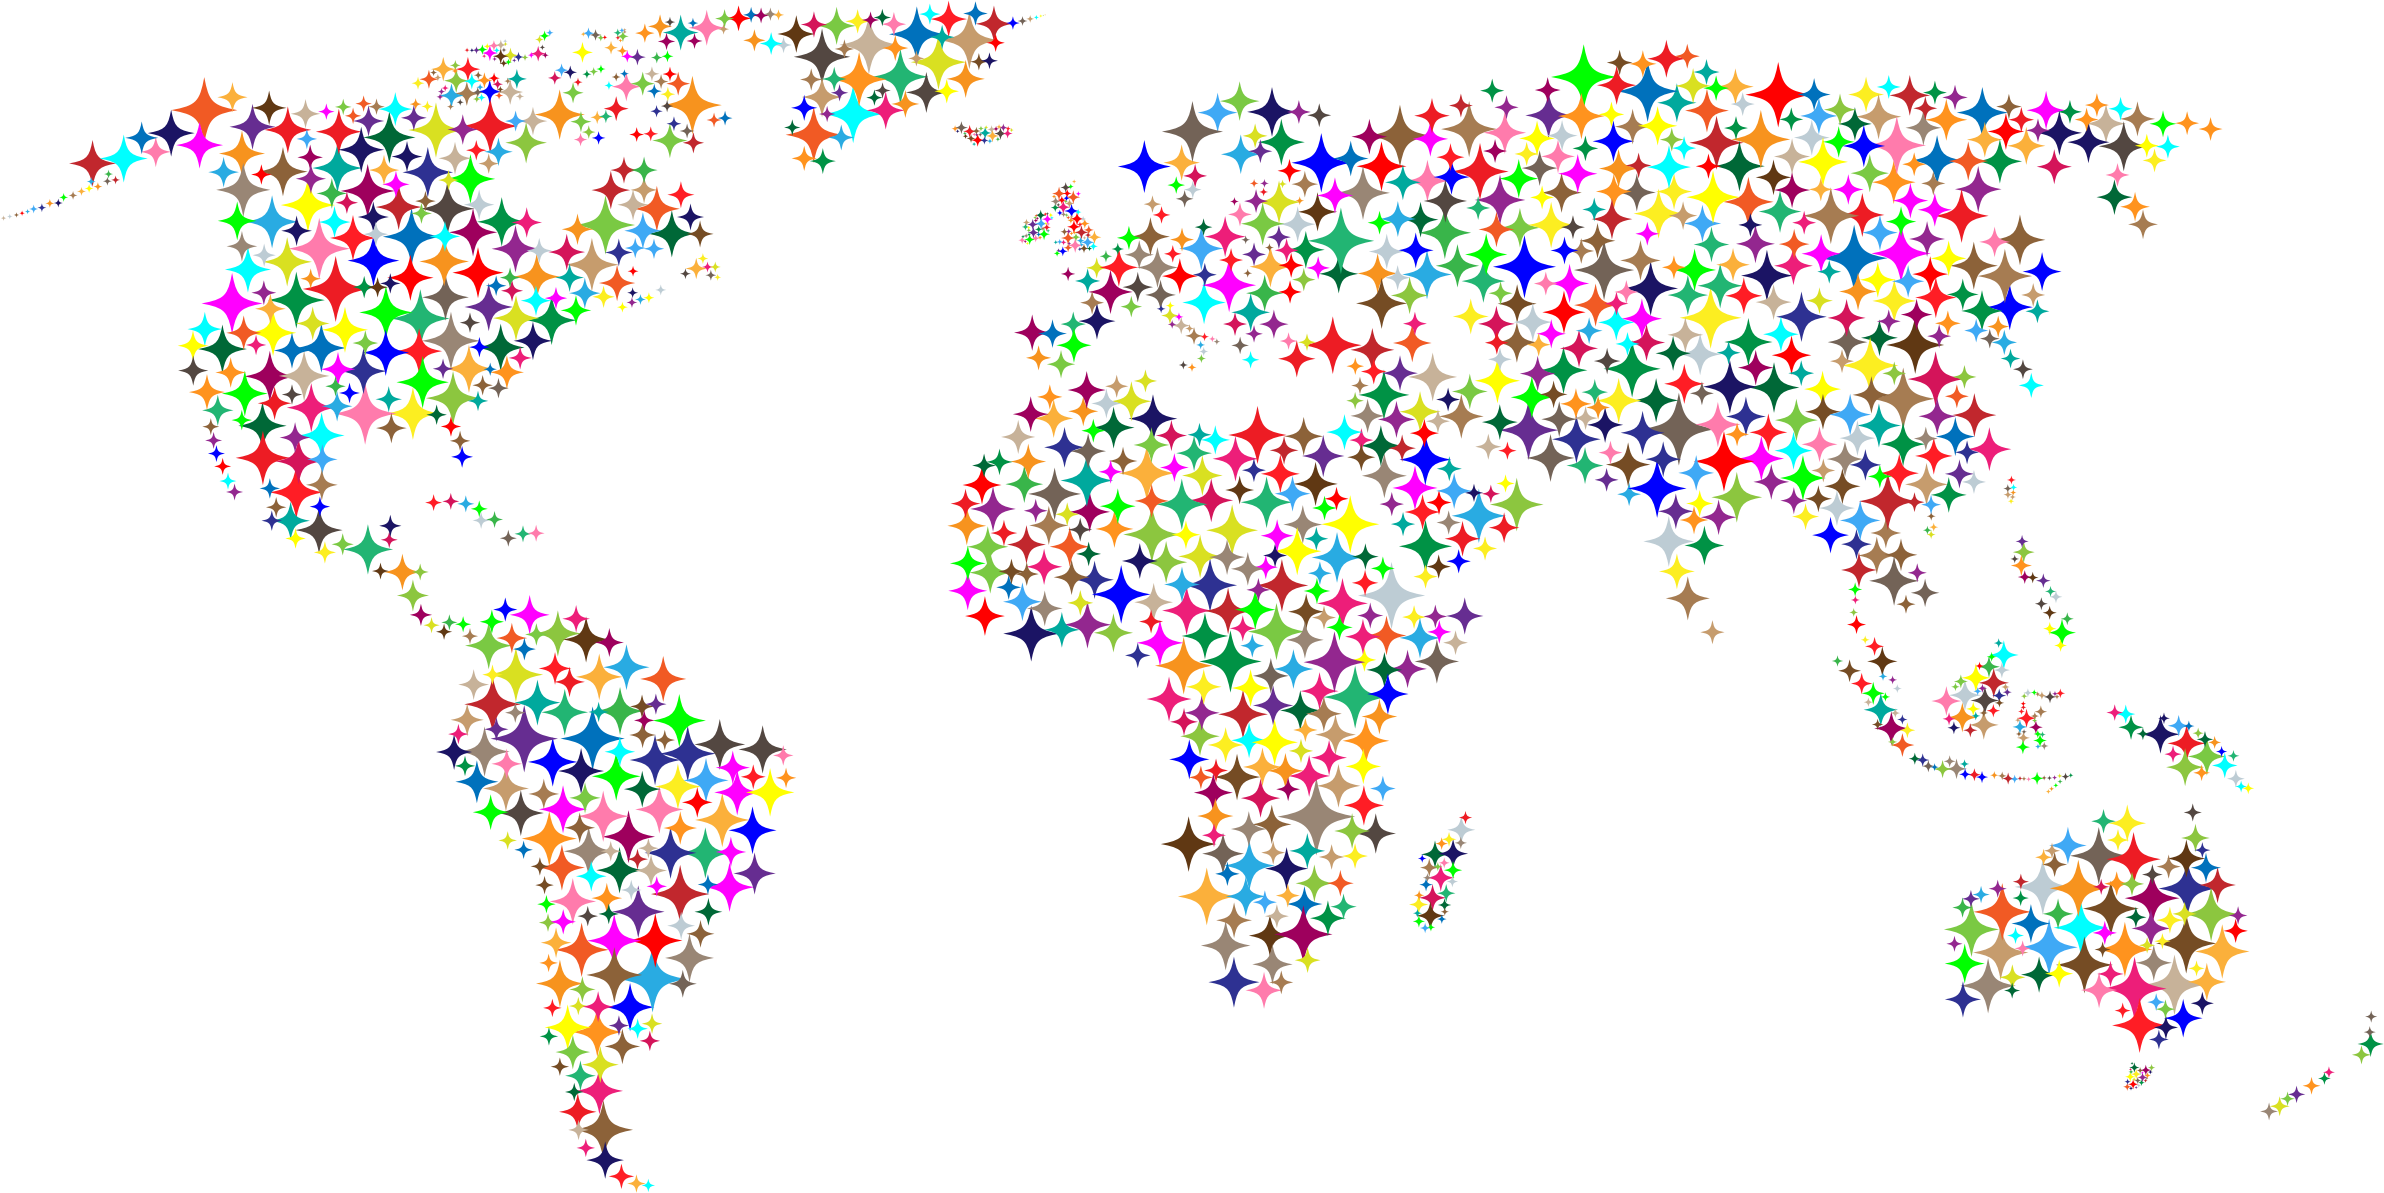 Clipart Colorful Diamonds World Map.